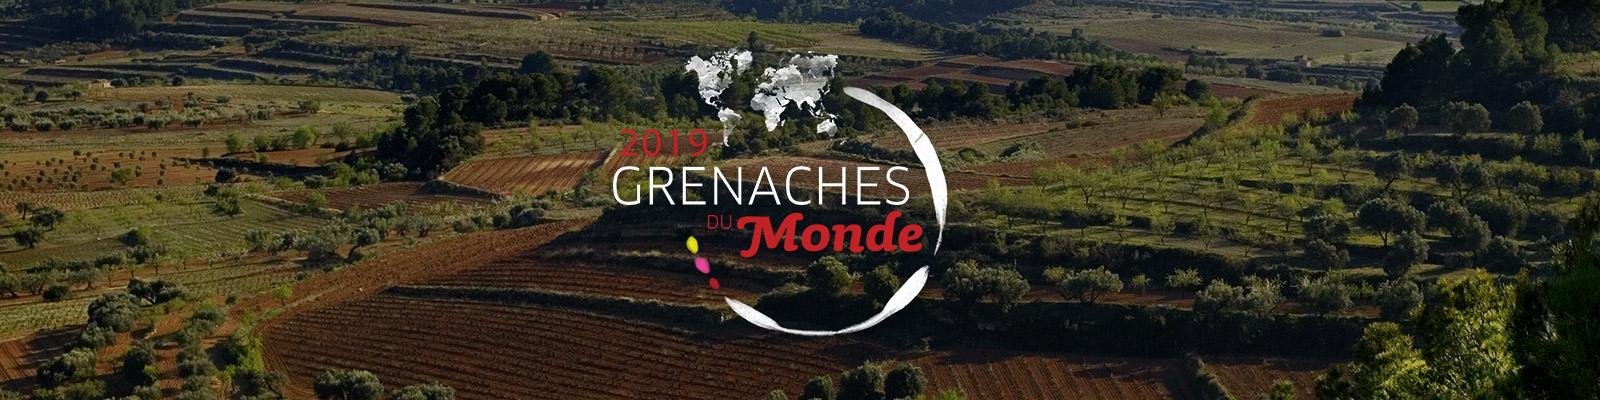 17 et 18 avril 2019 – Grenaches du Monde